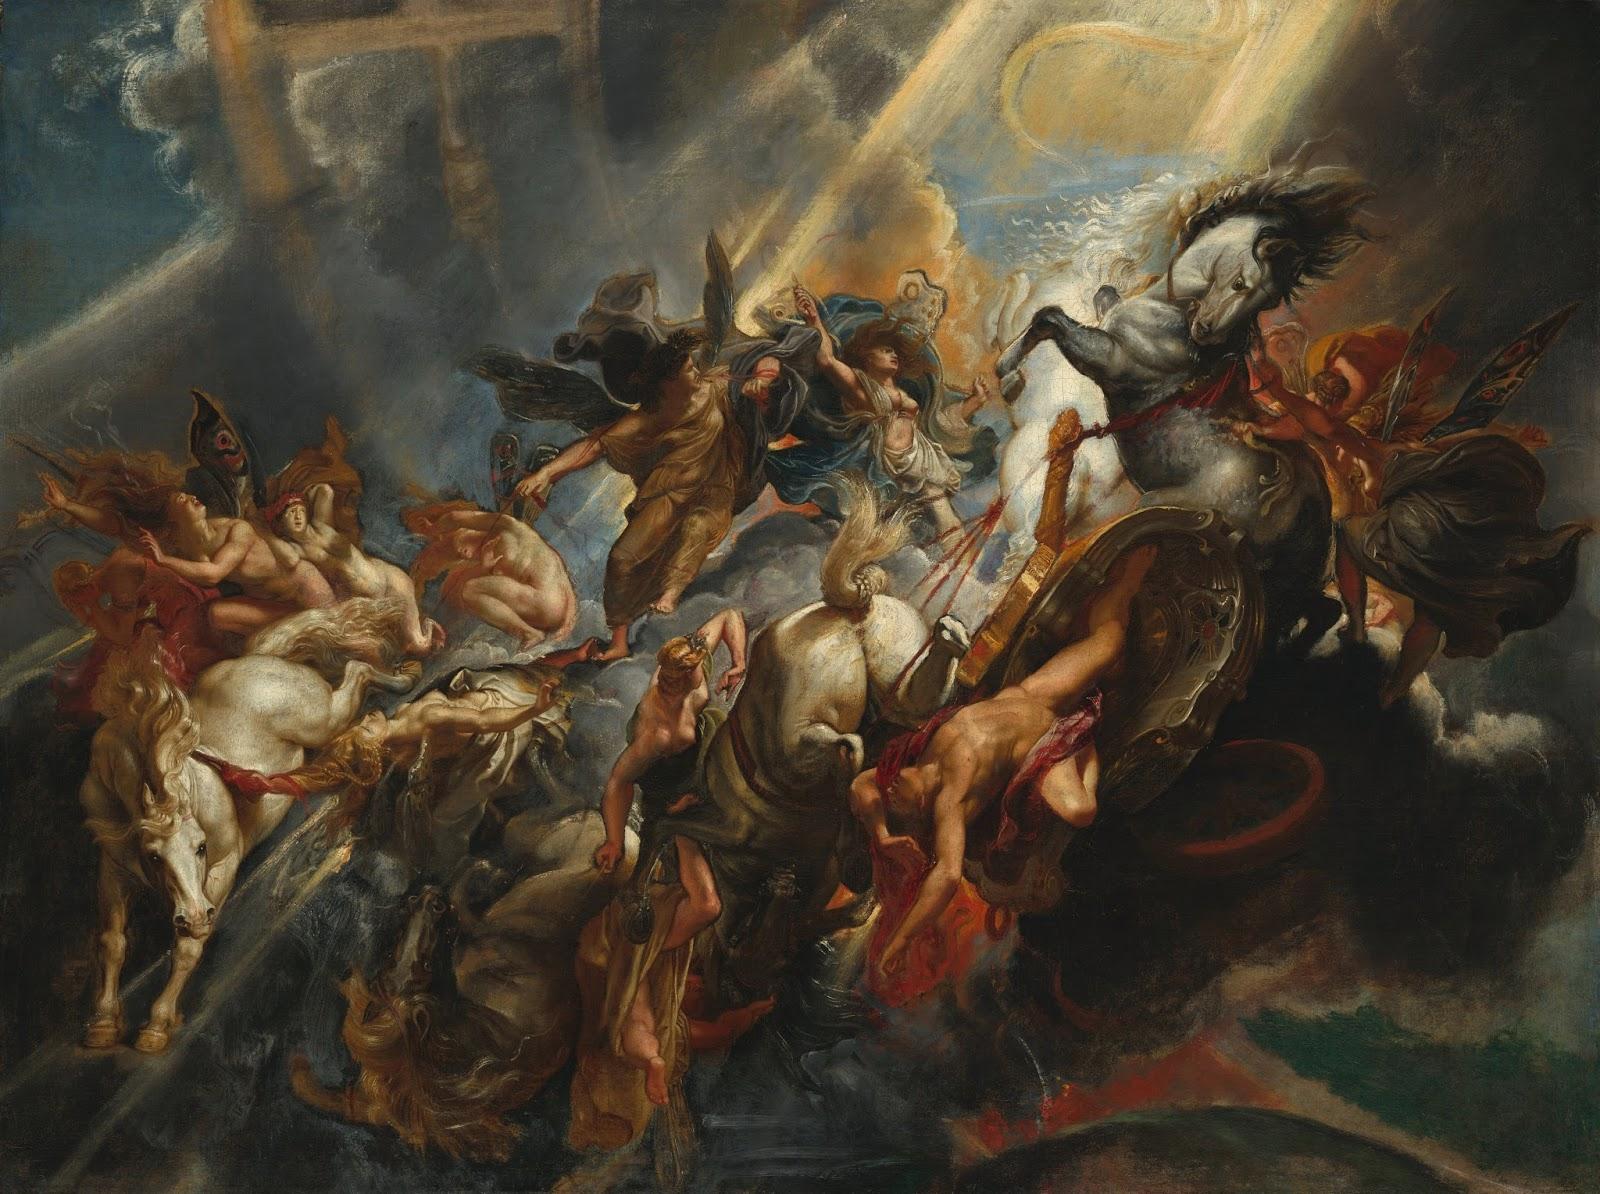 Peter_Paul_Rubens_-_The_Fall_of_Phaeton_(National_Gallery_of_Art)